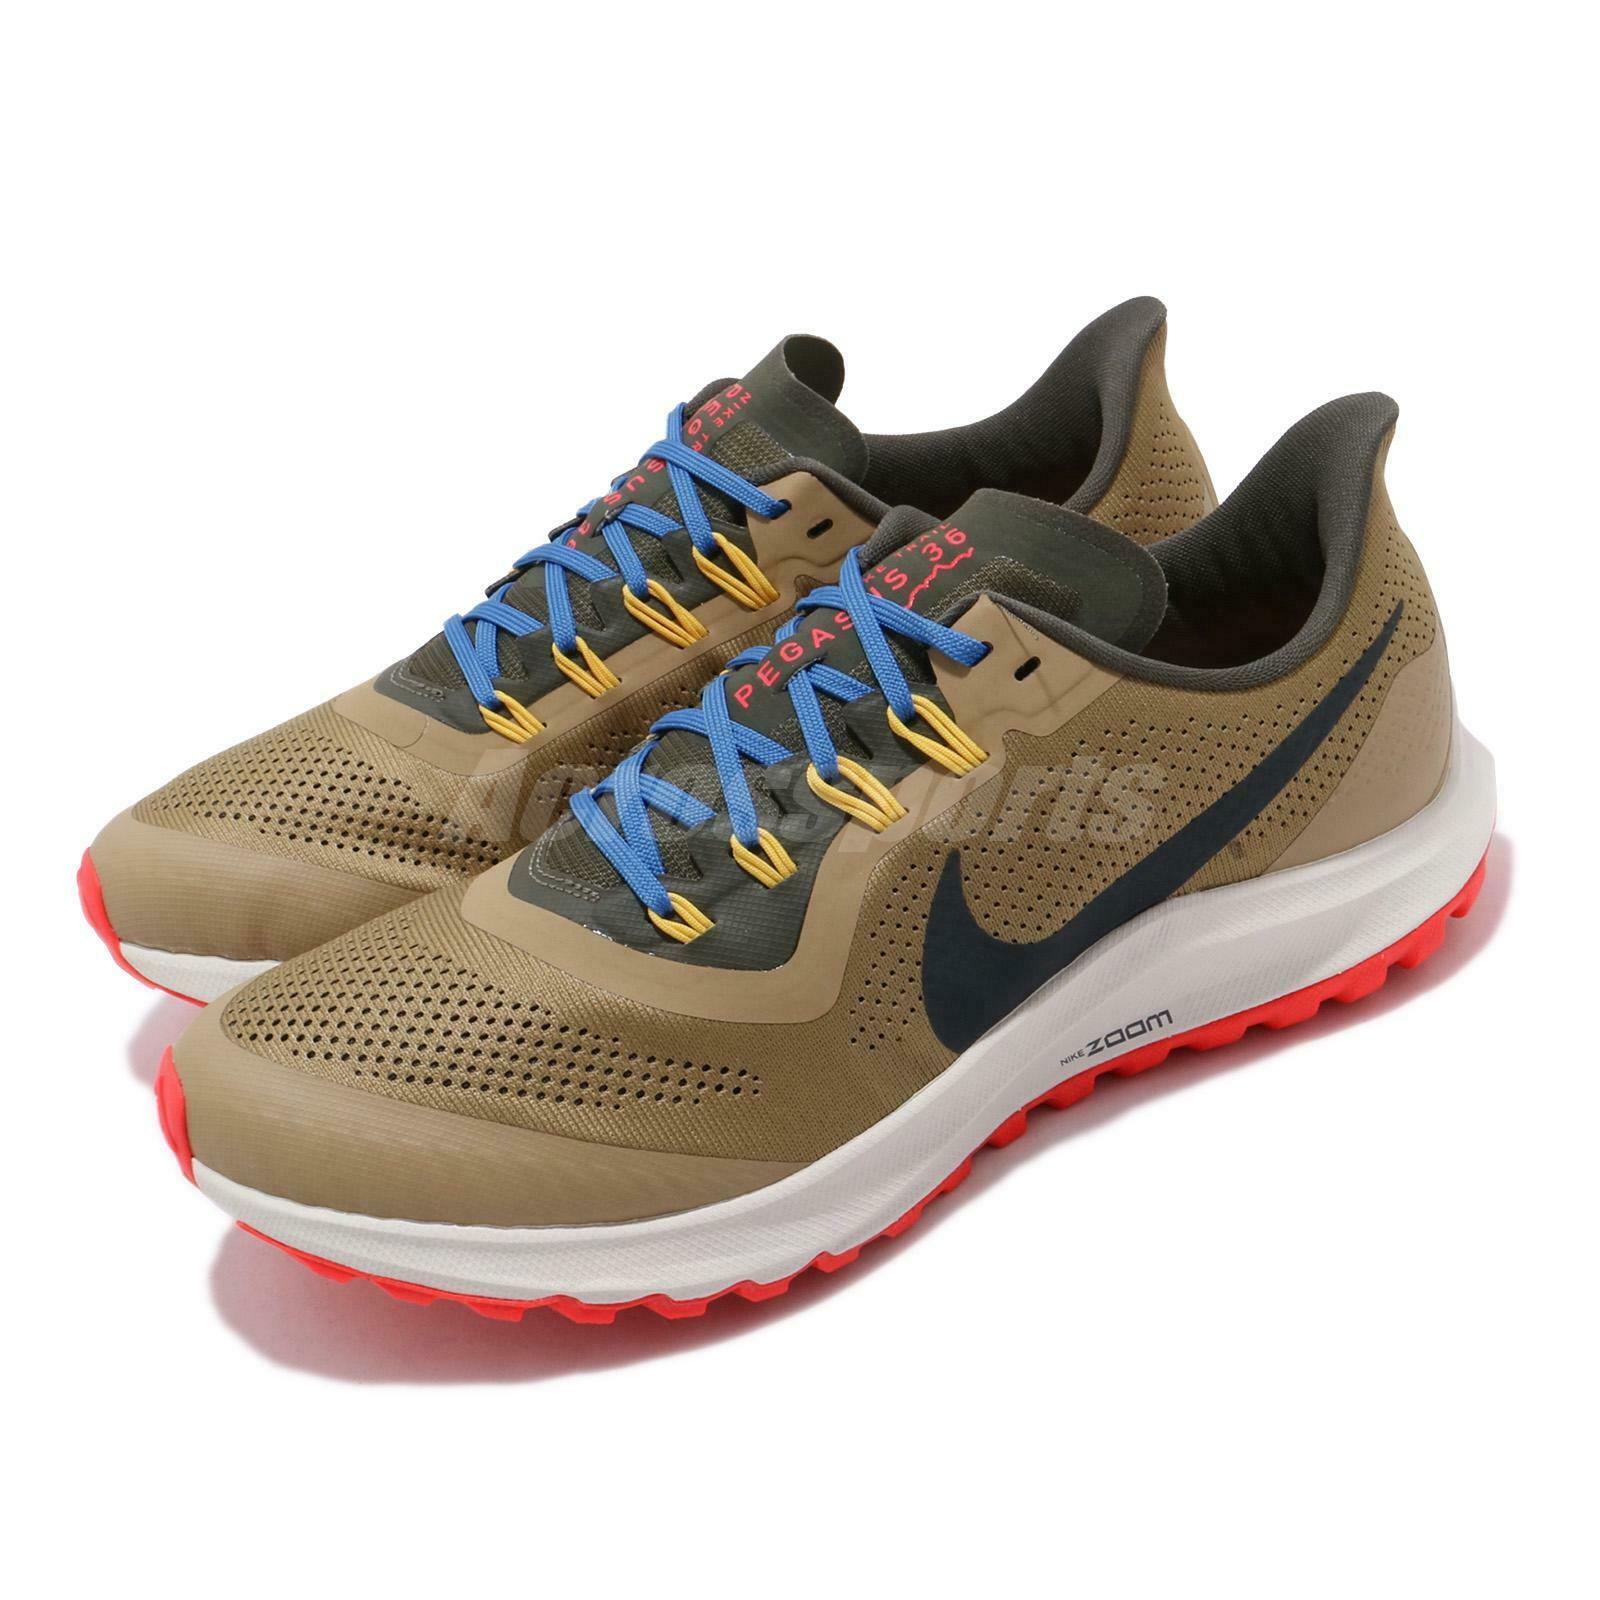 Nike Air Zoom Pegasus 36 Trail bruin zwart mannen Buitenshuis hardlopen schoenen AR5677-200